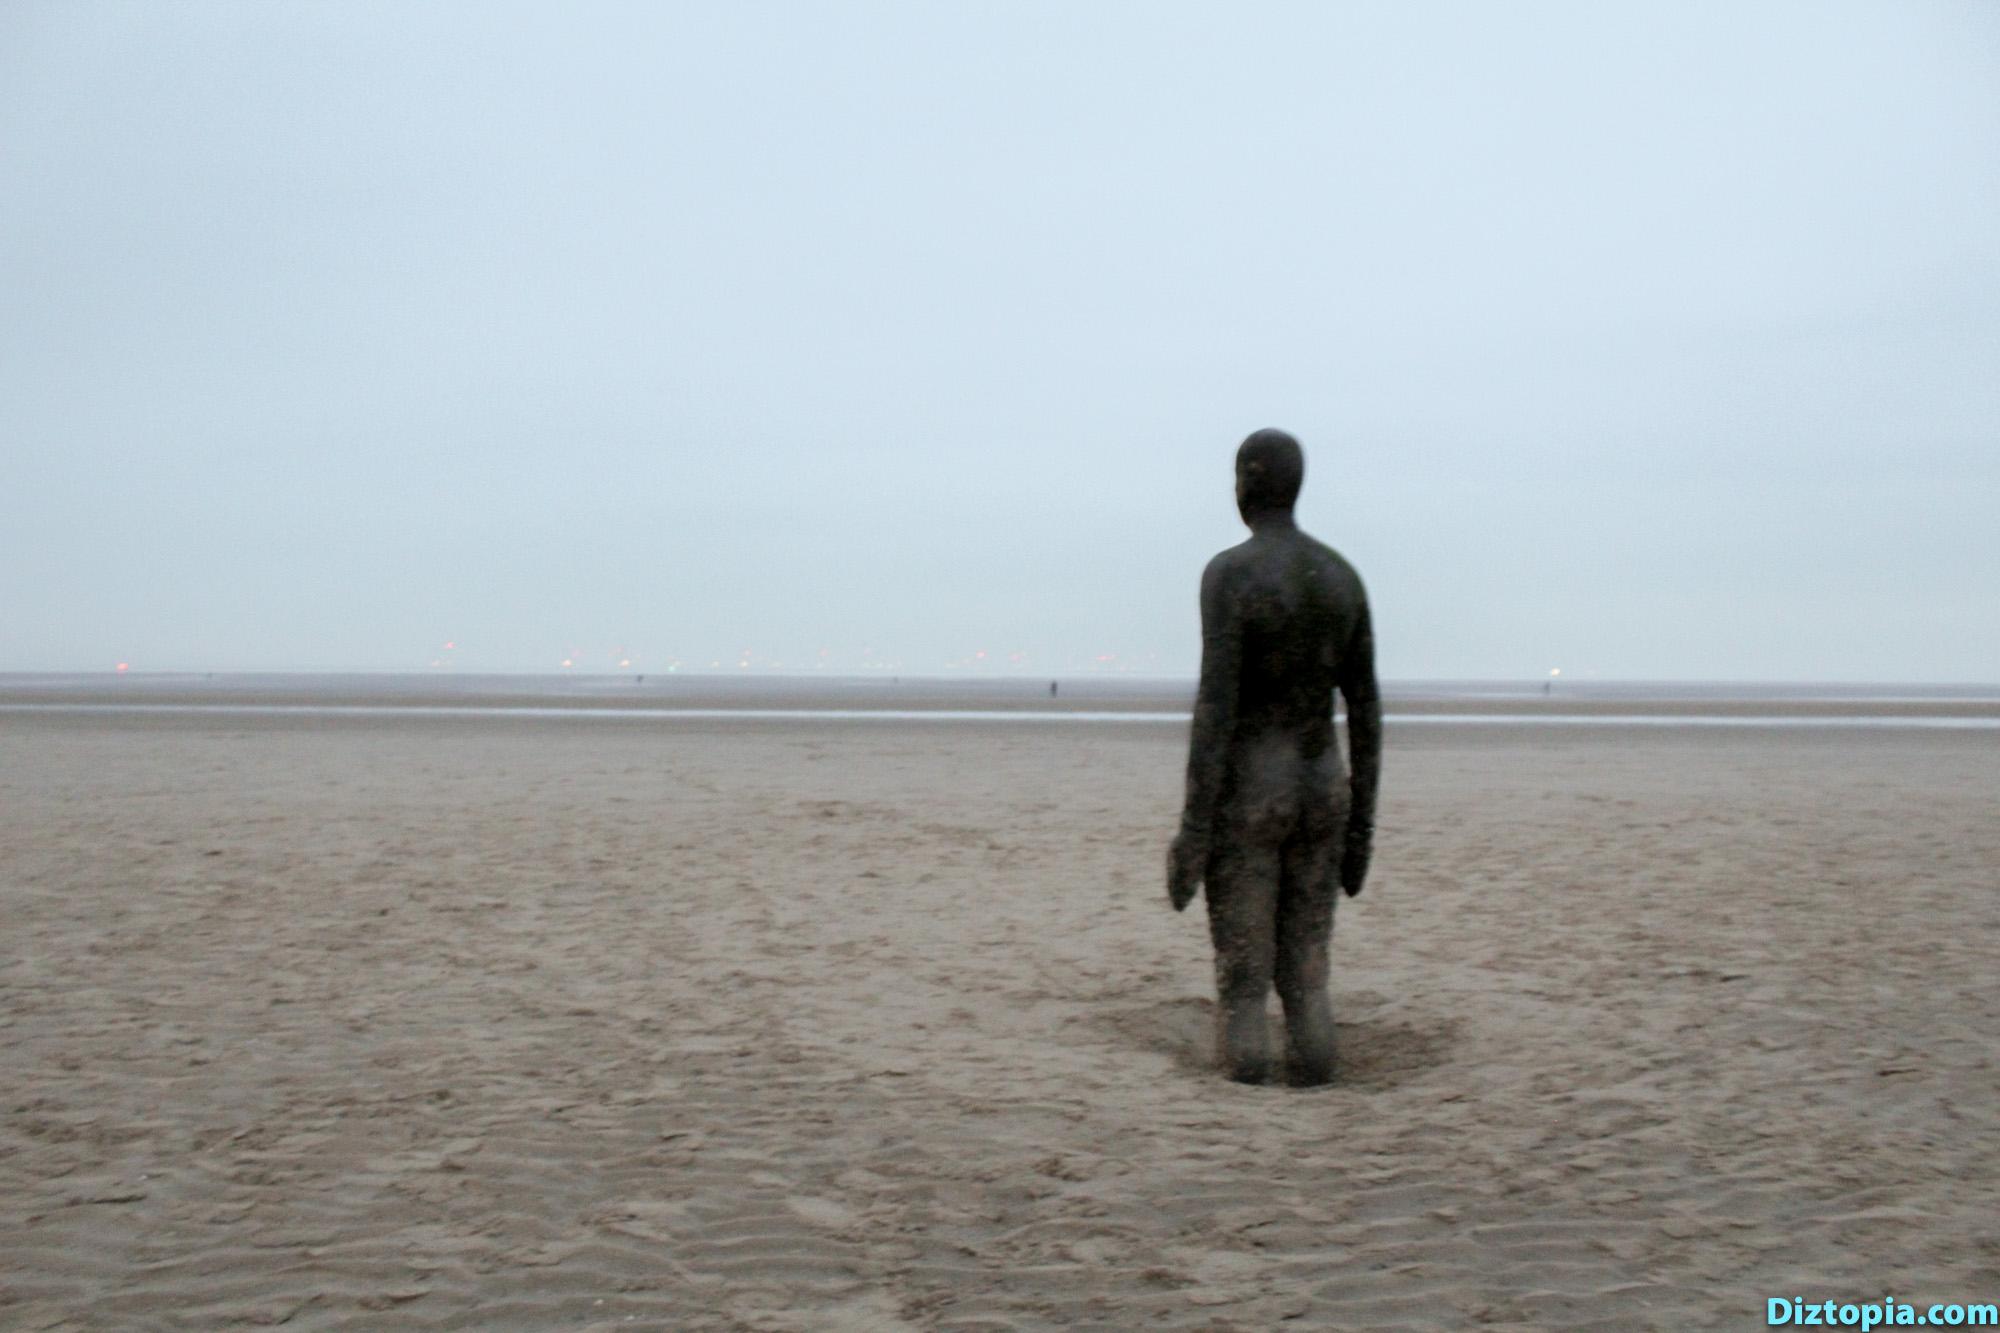 Liverpool-City-UK-Diztopia-Dizma-Dahl-Photography-2017-34-Another-Place-Antony-Gormley-Sculpture-Crosby-Beach-Cast-Iron-Statue-Nature